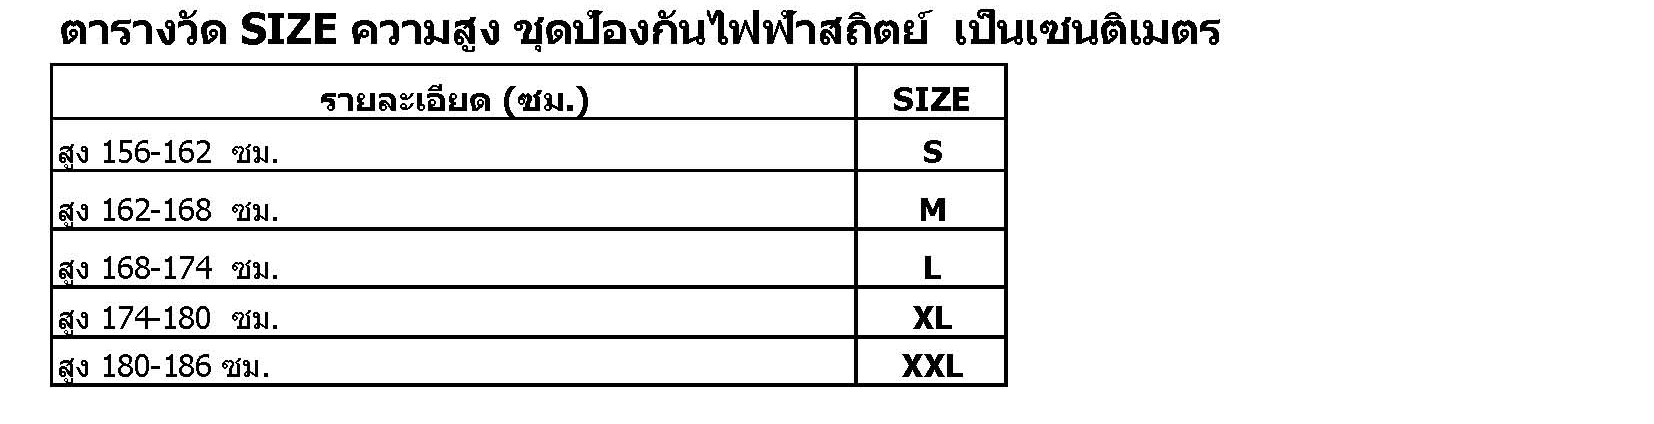 http://thailandsafety.com/wp-content/uploads/2016/09/%E0%B8%8A%E0%B8%B8%E0%B8%94%E0%B8%84%E0%B8%A5%E0%B8%B5%E0%B8%99%E0%B8%A3%E0%B8%B9%E0%B8%A1-3.jpg